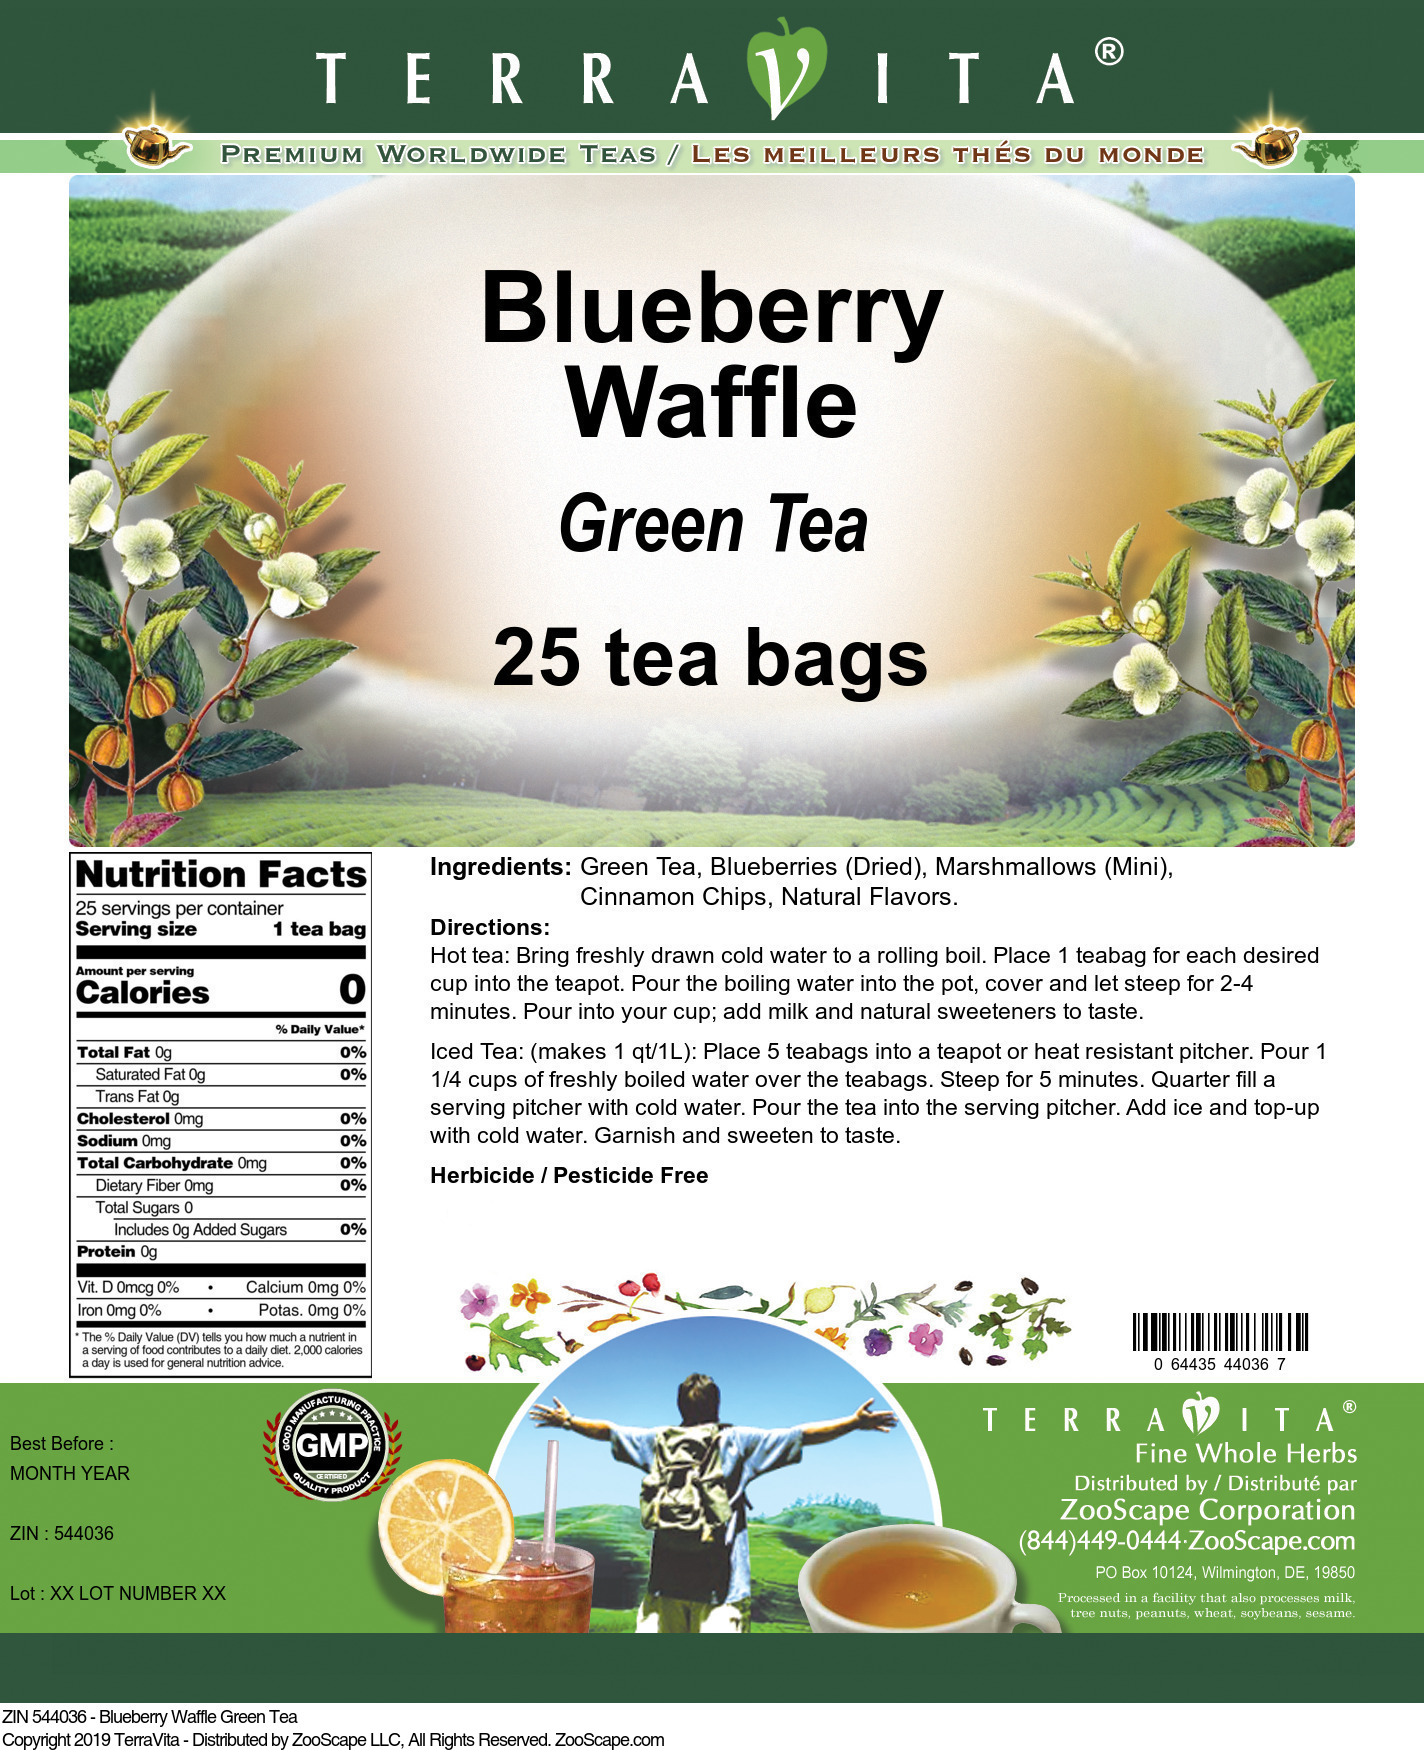 Blueberry Waffle Green Tea